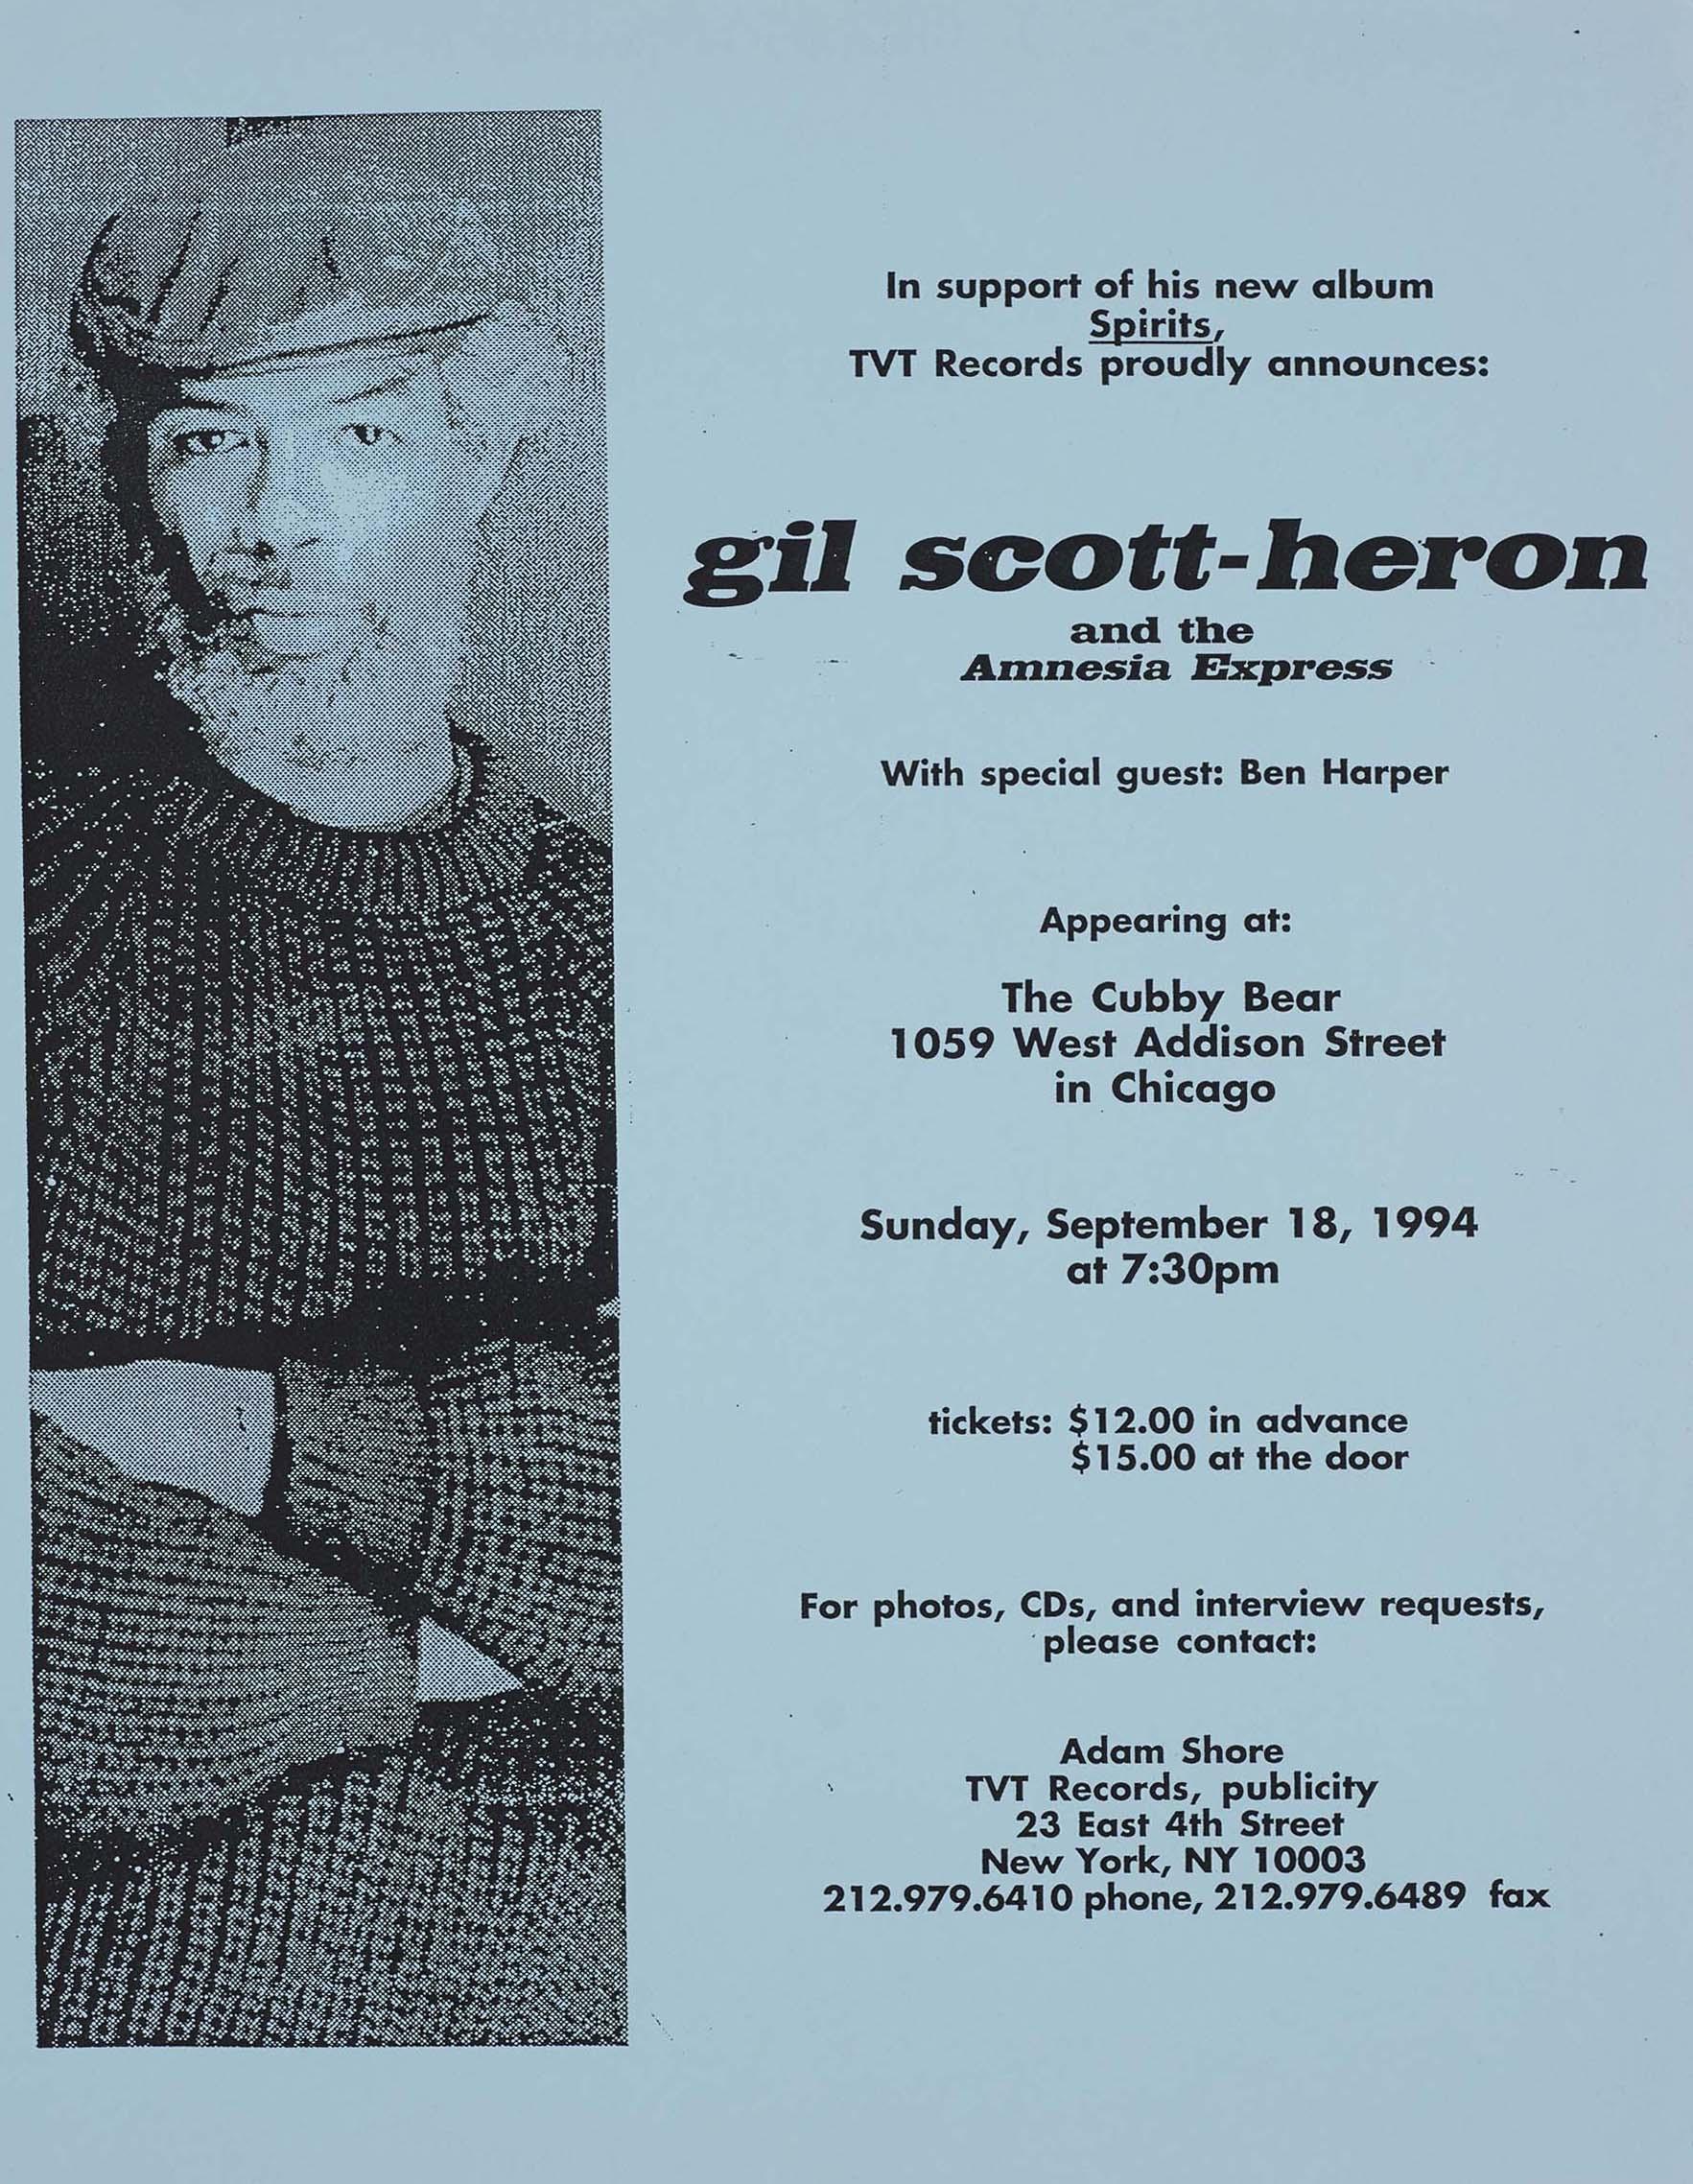 Gil Scott-Heron advertisement